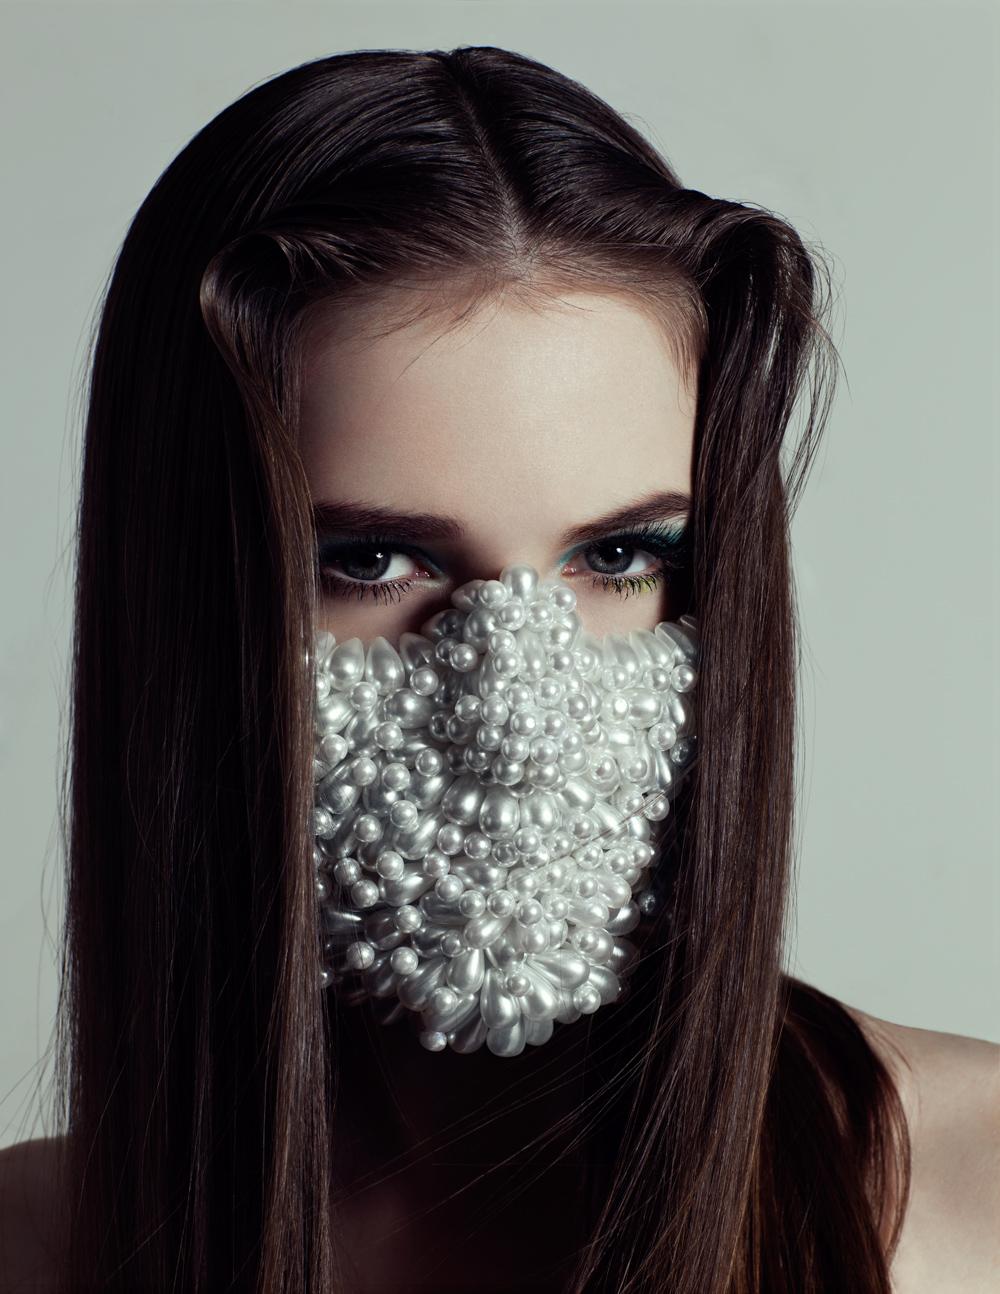 HELLOANNE_LADYGUNN01